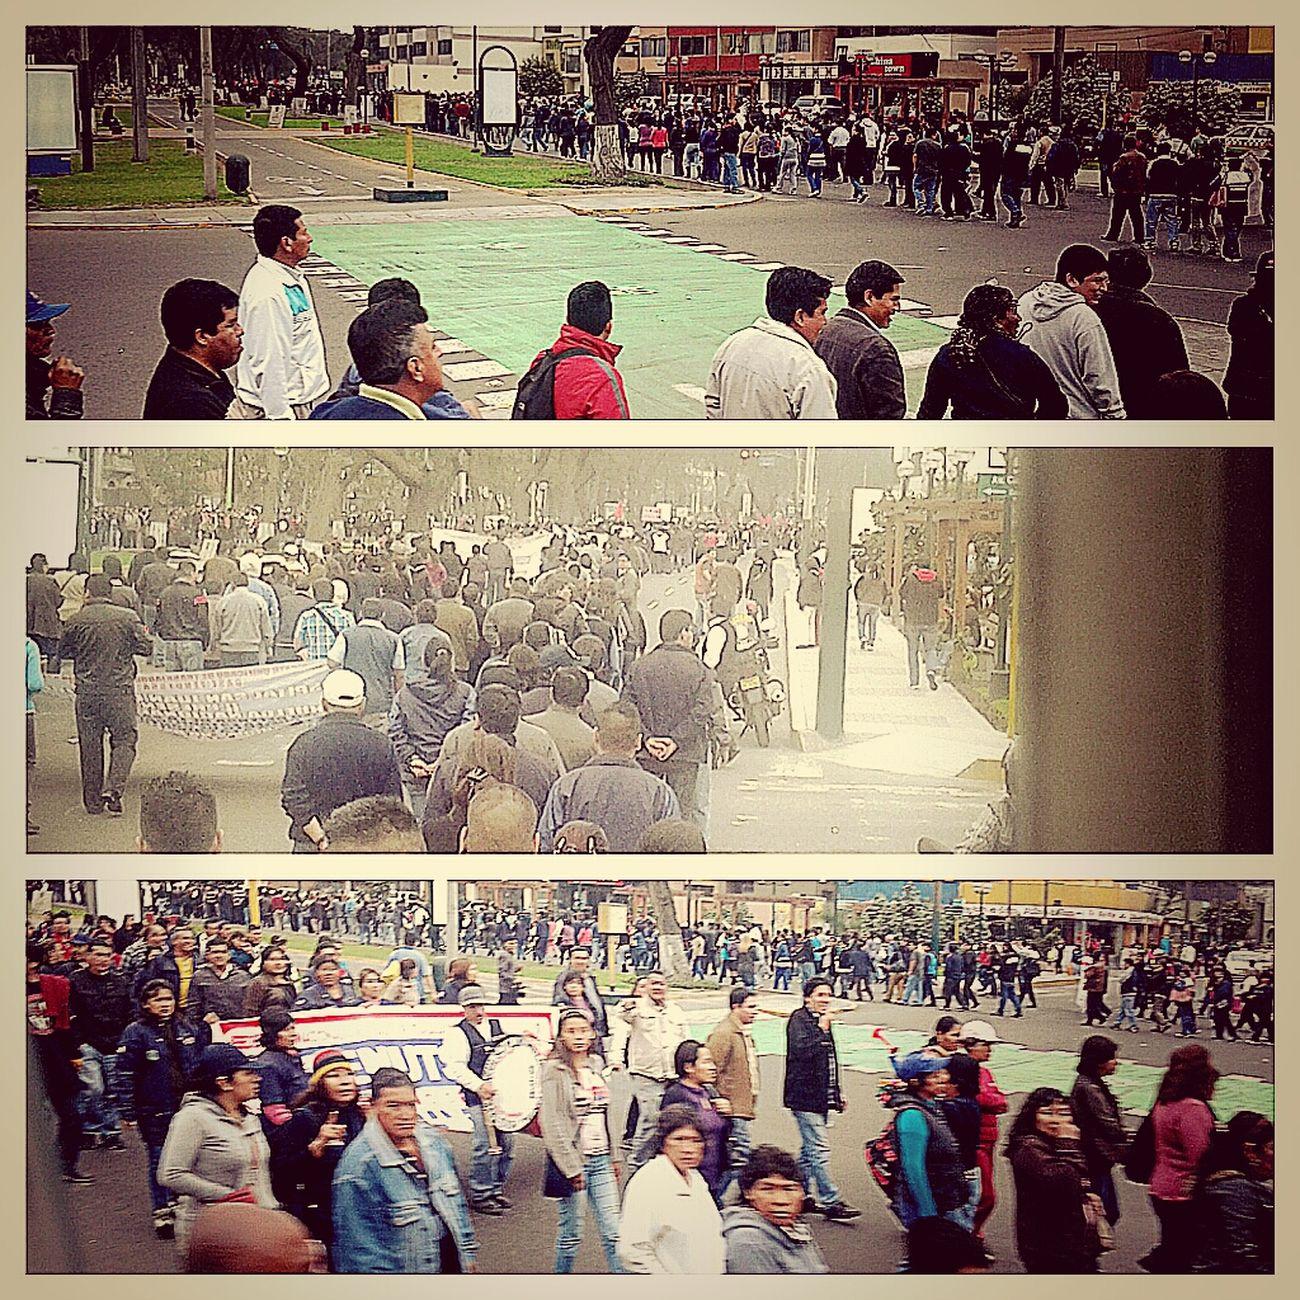 Manifestación Manifestación Manifestation Gentensity